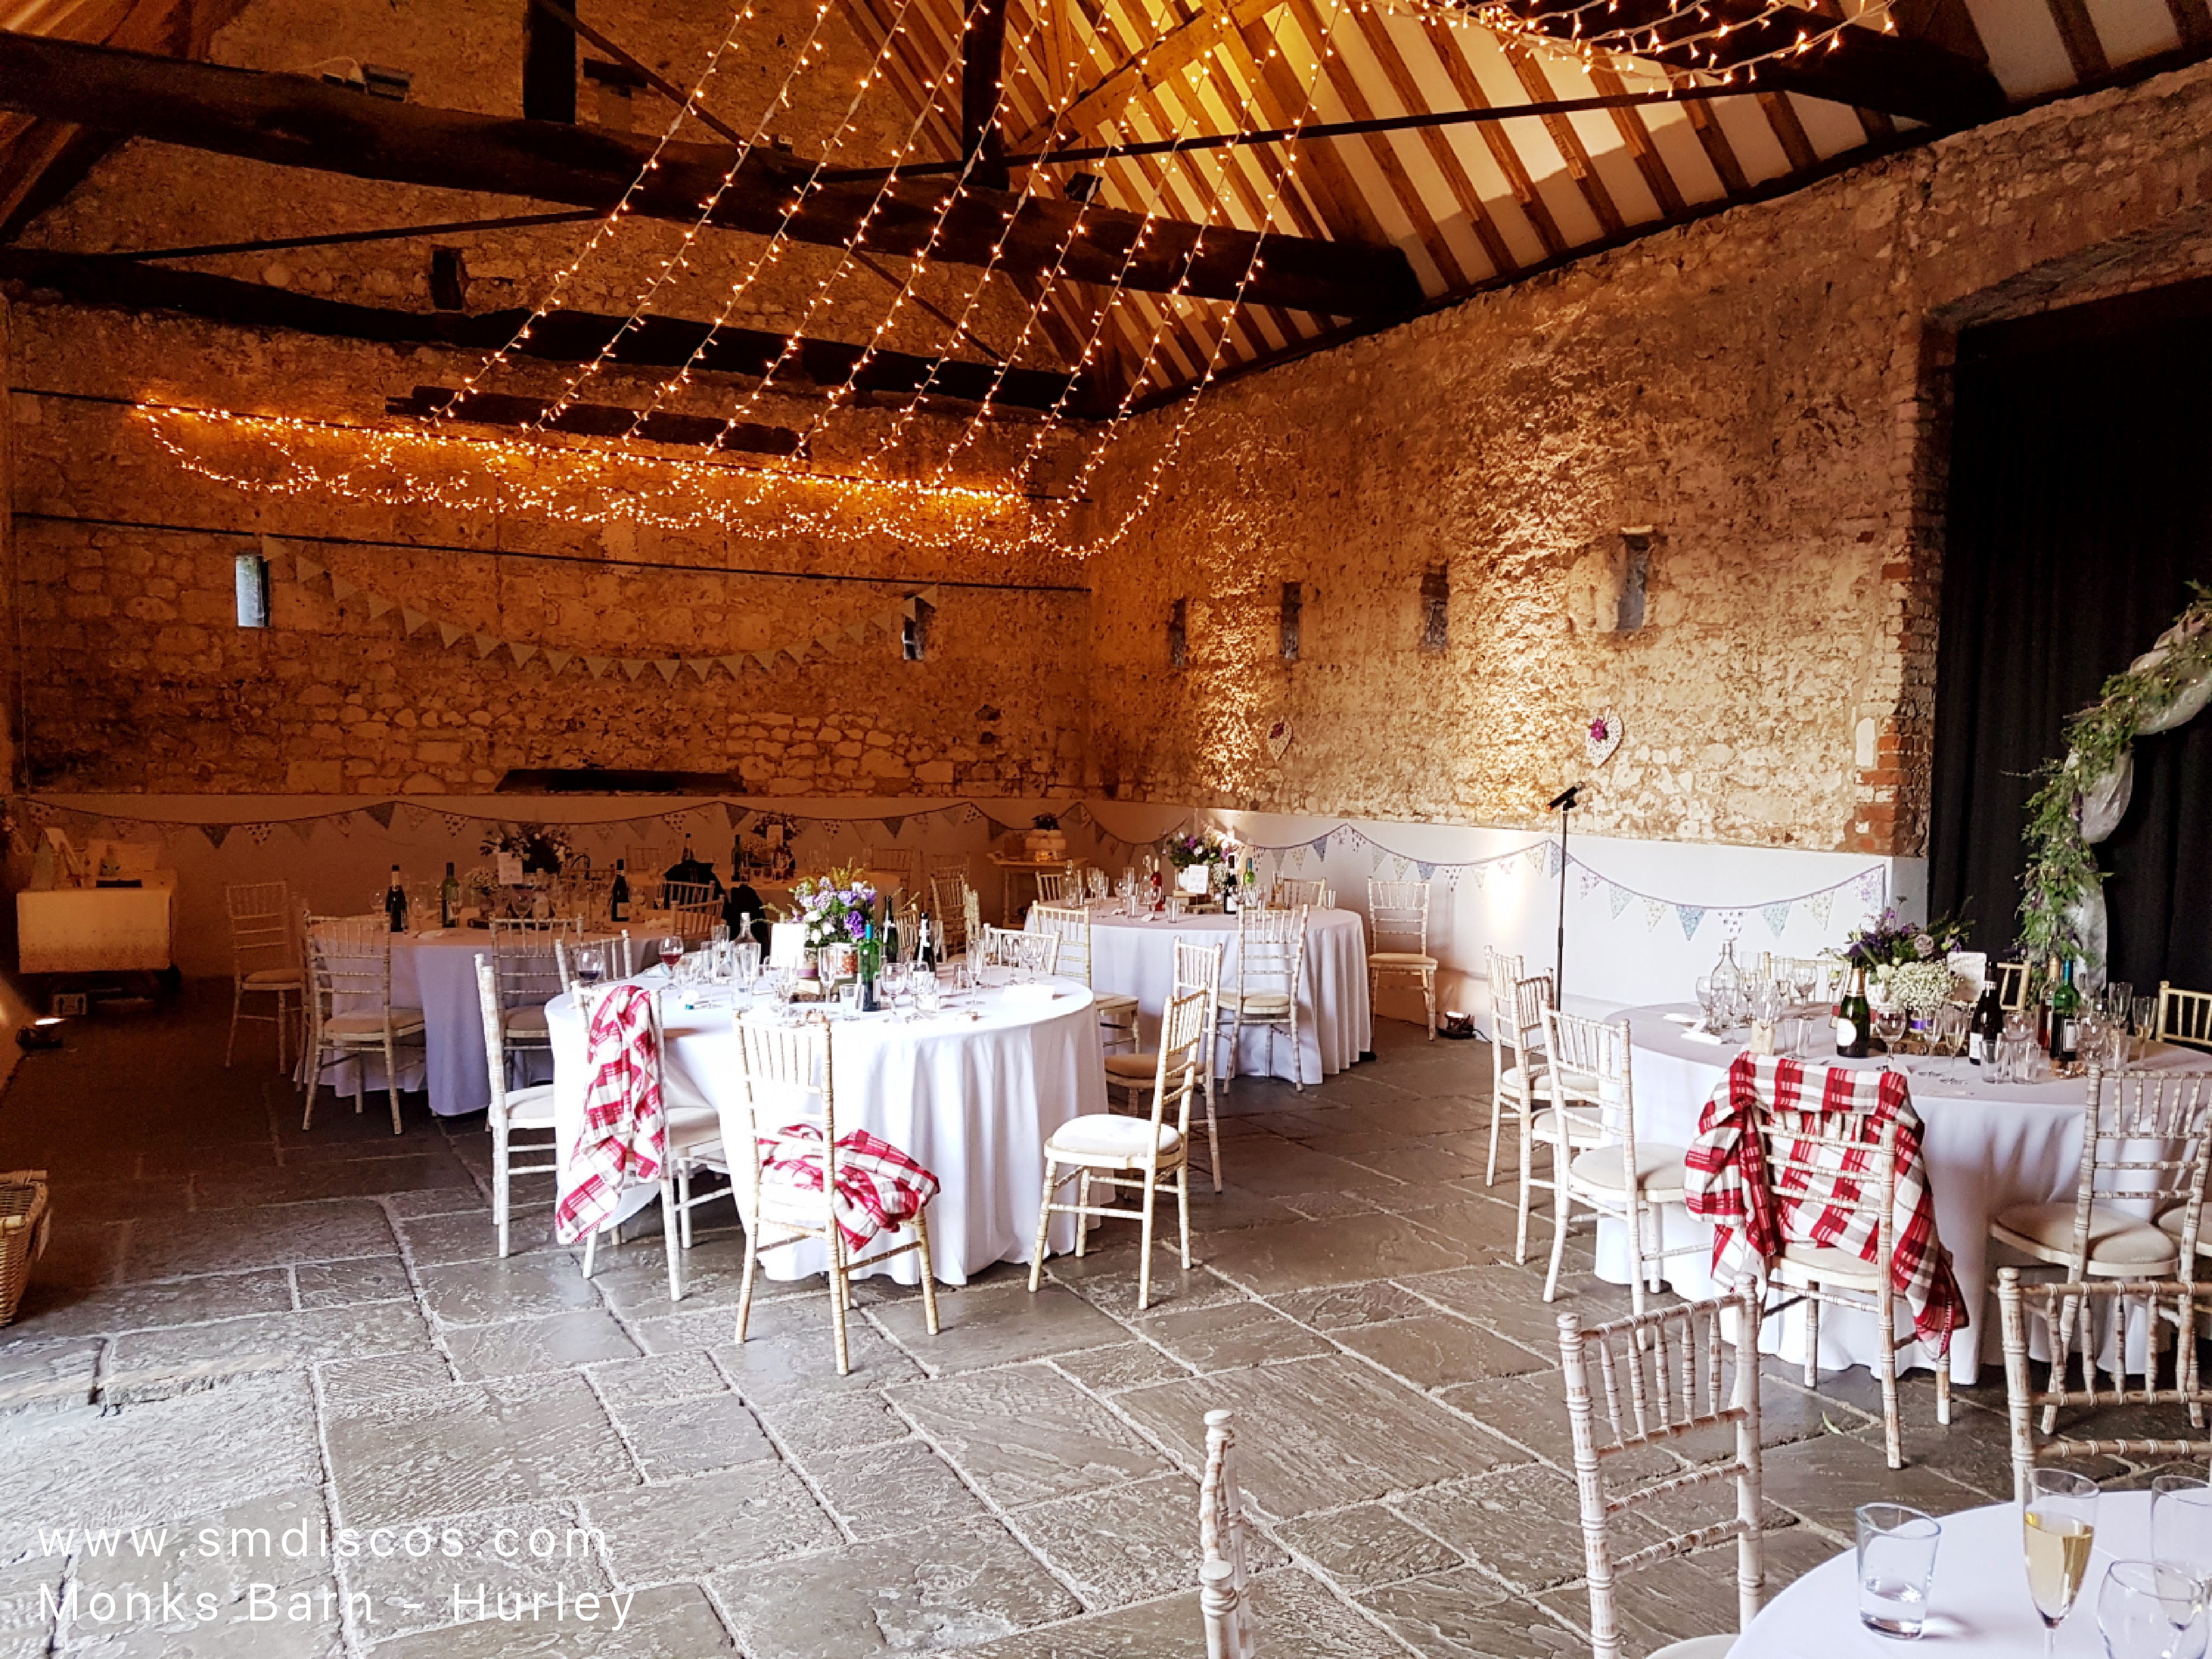 Hurley Wedding at Monks Barn